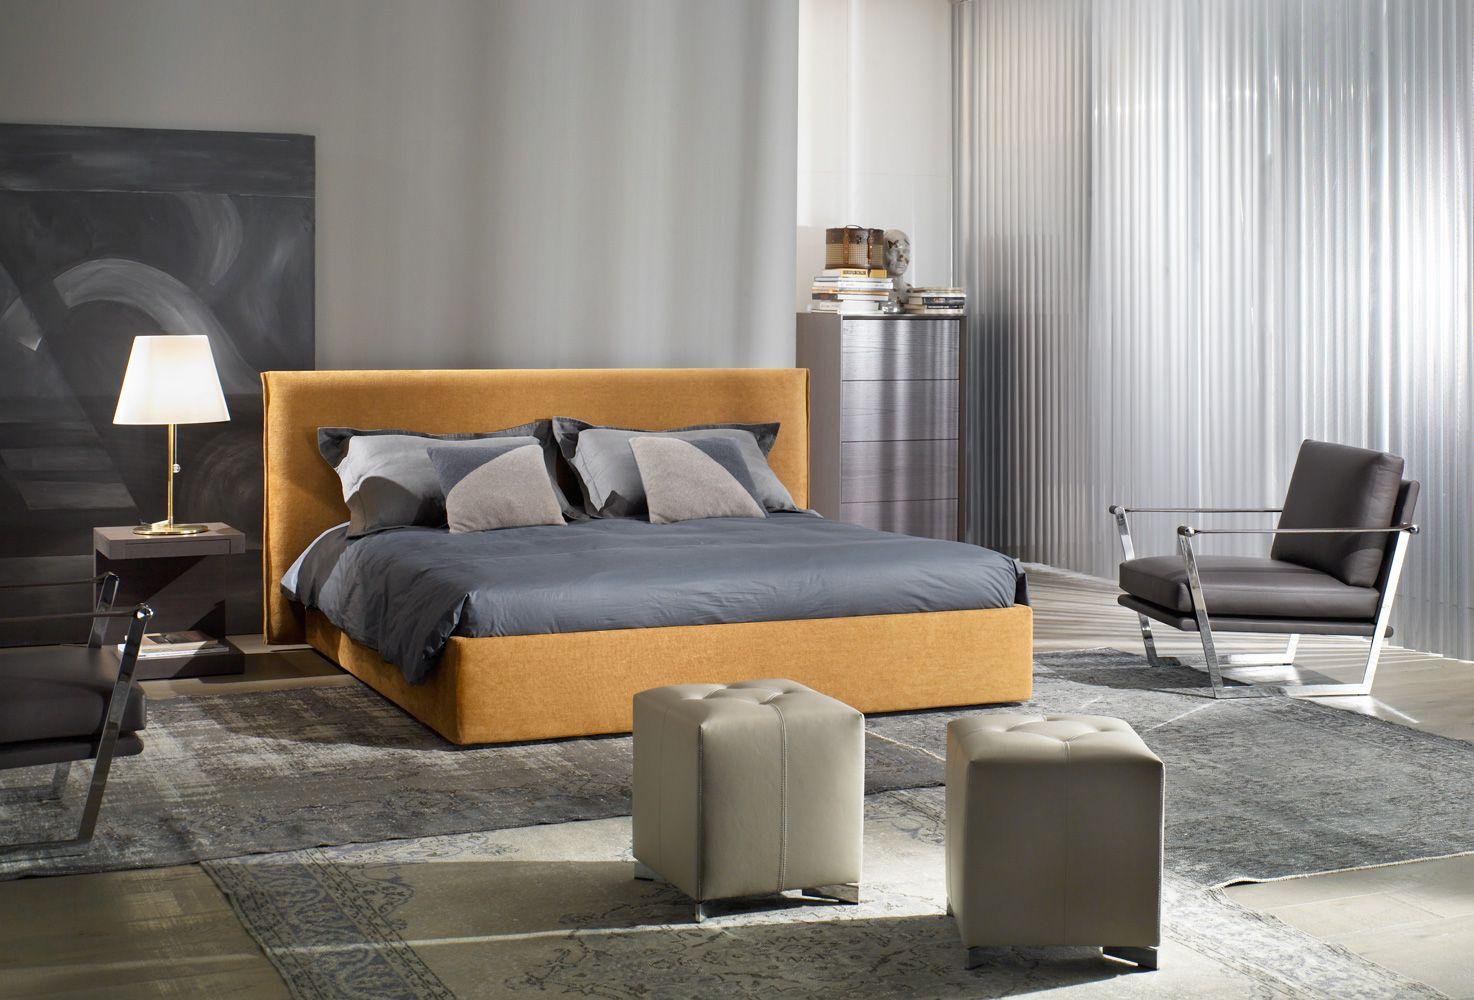 Casades s furniture design barcelona jersey collection - Sofas diseno barcelona ...